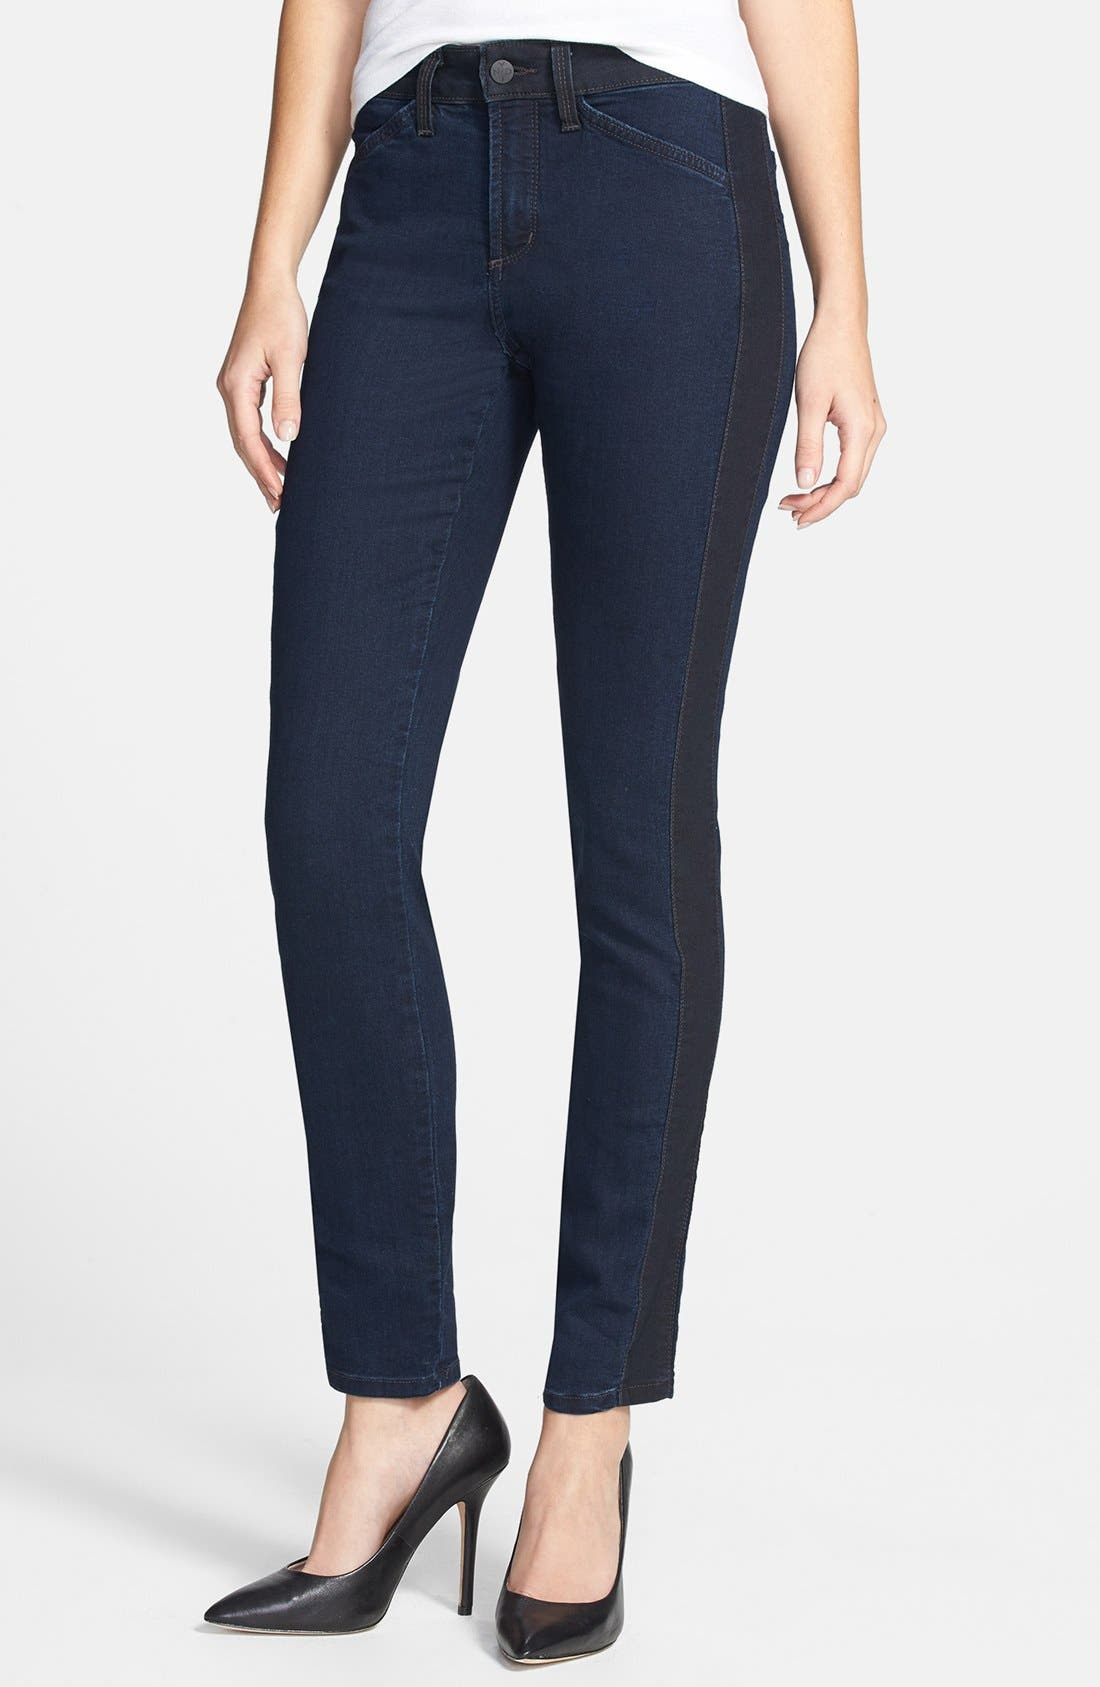 Main Image - NYDJ 'Alexandra' Tuxedo Stripe Stretch Skinny Jeans (Covina)